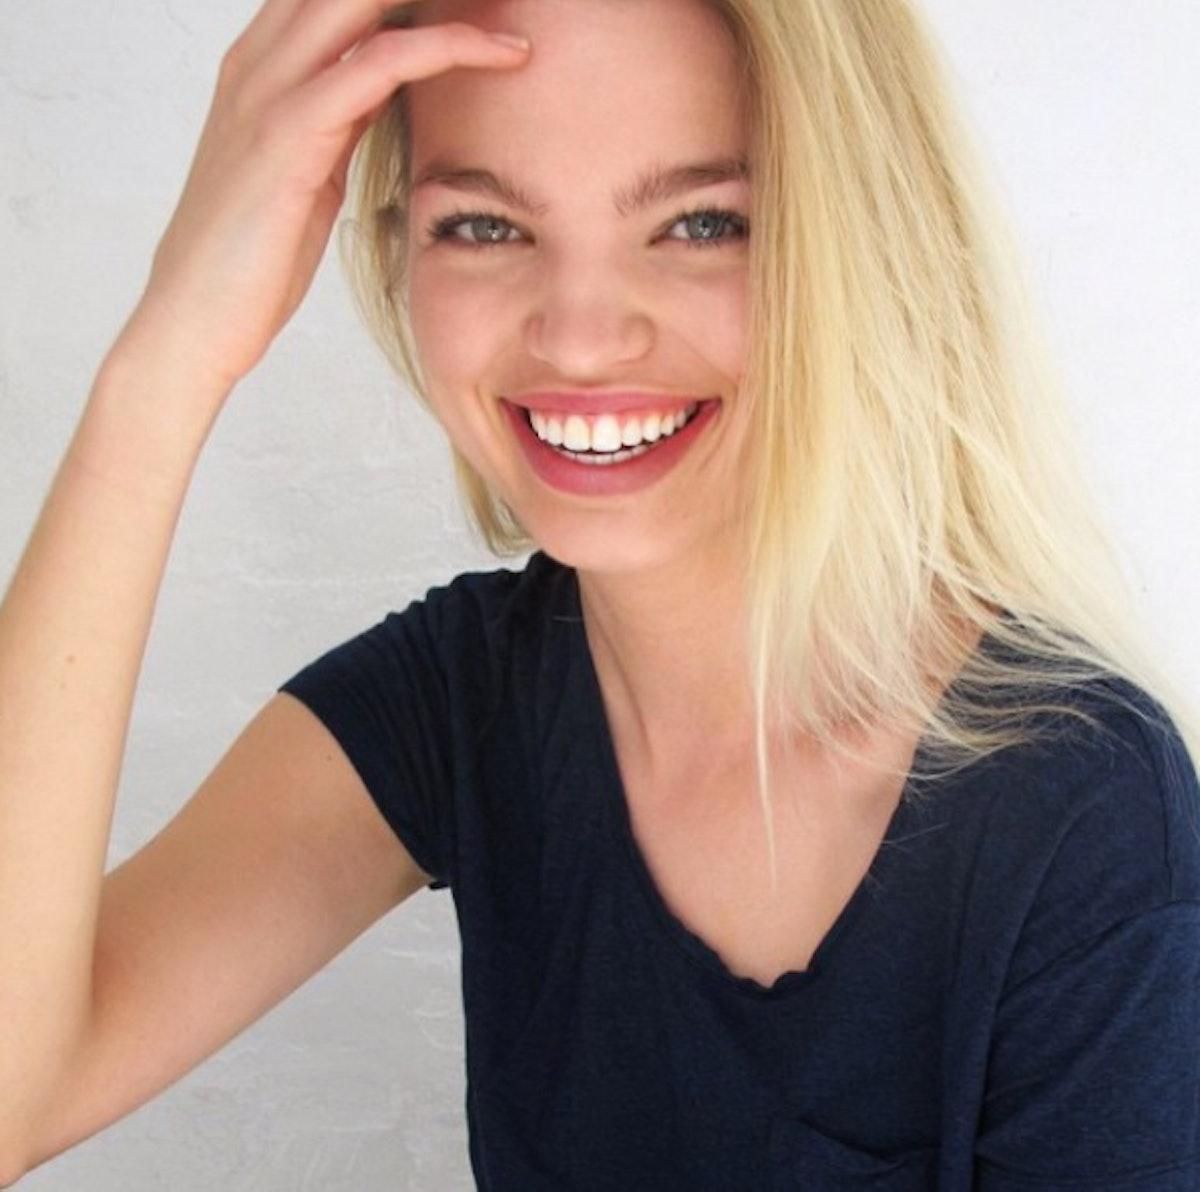 Model Beauty Advice